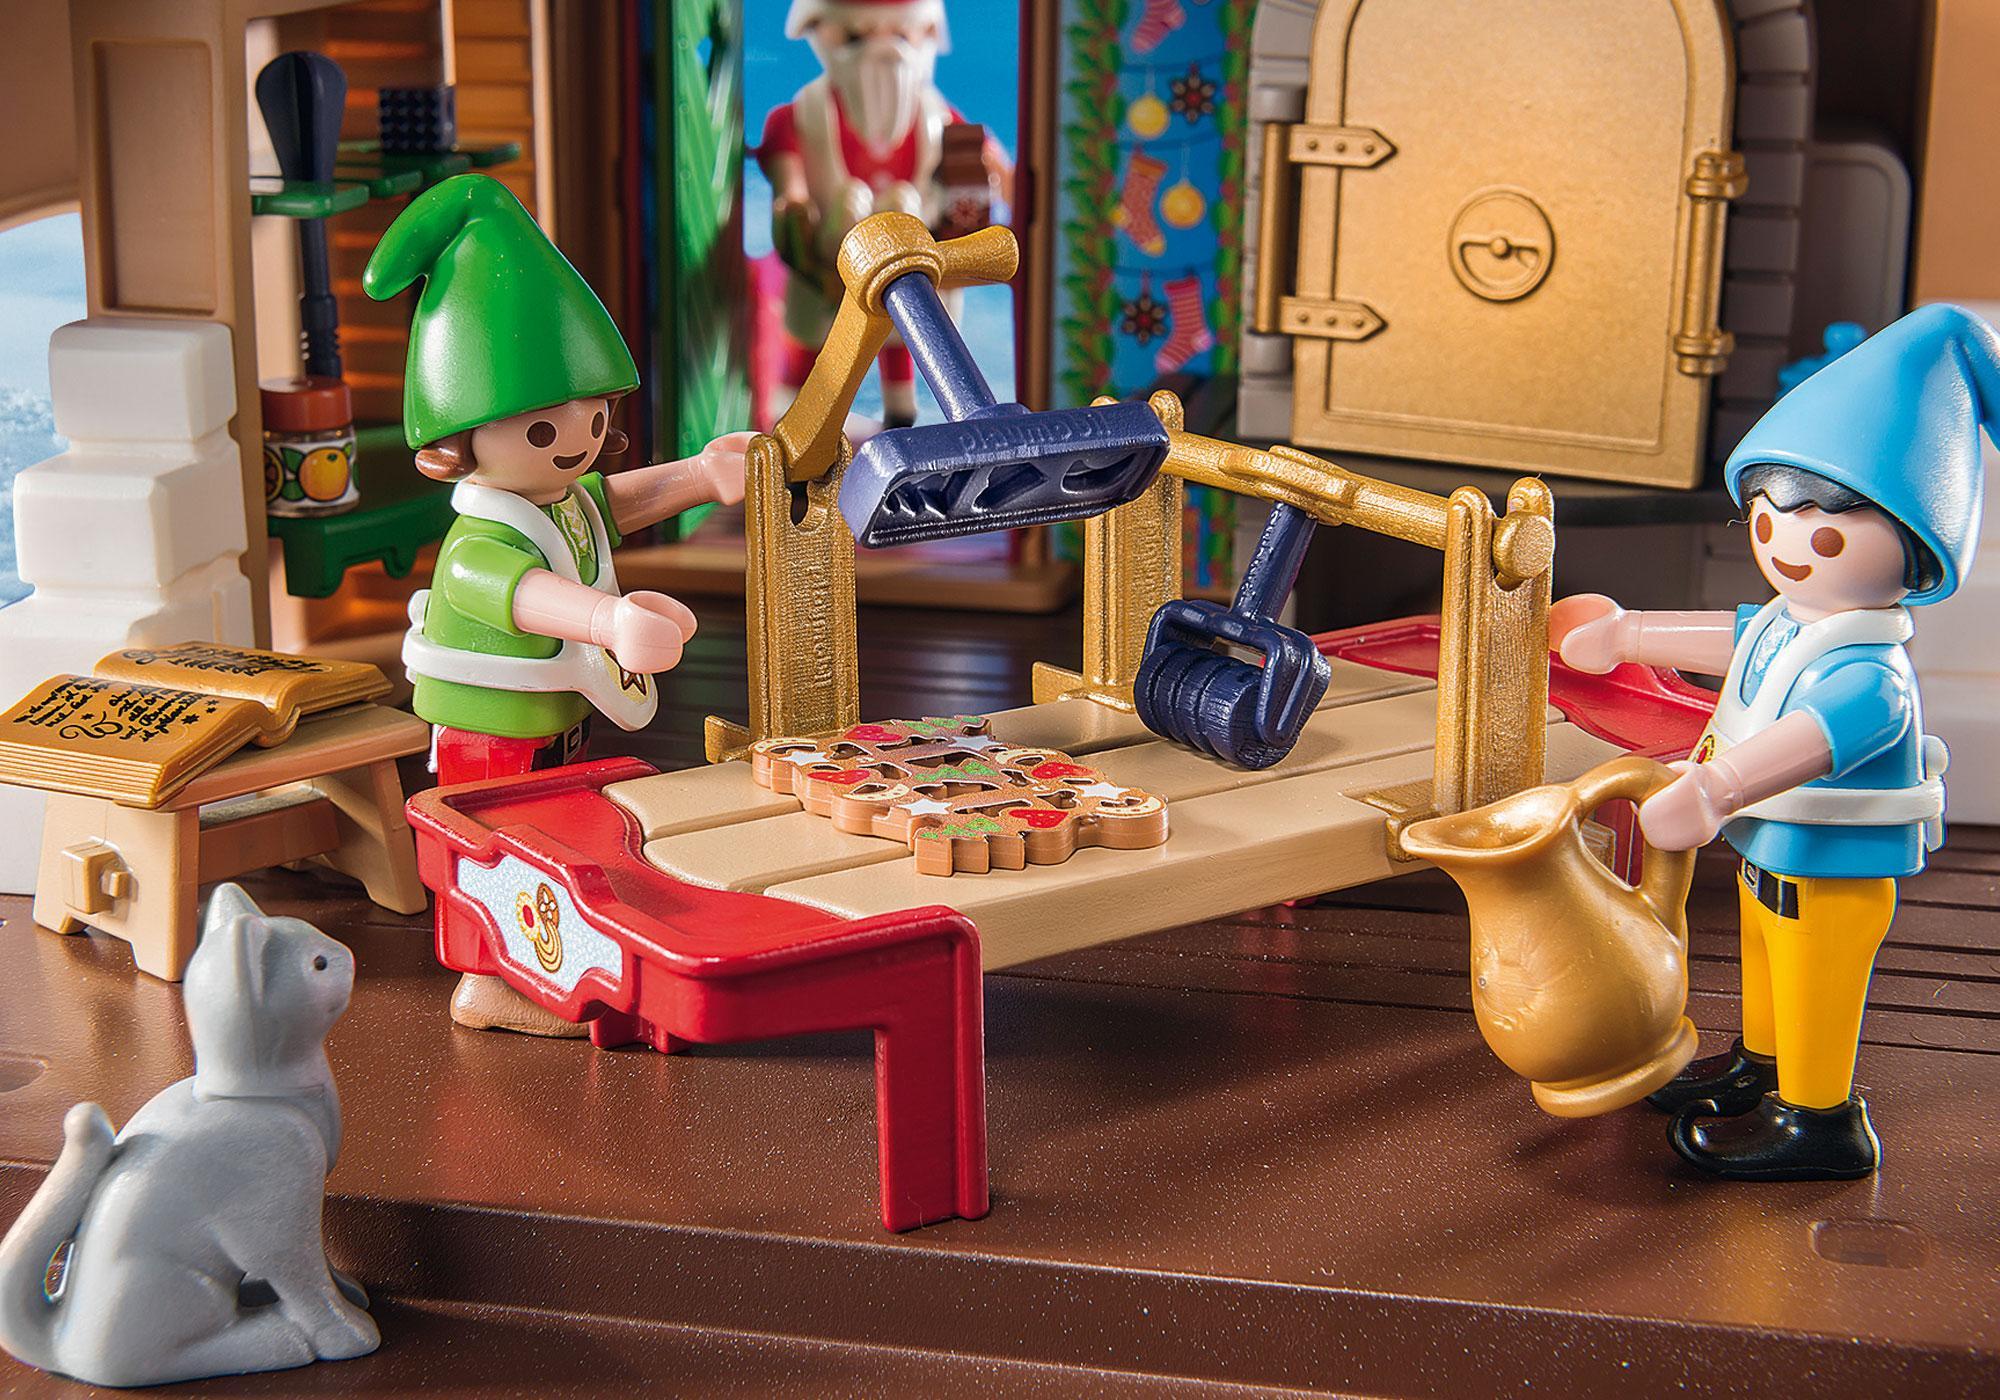 http://media.playmobil.com/i/playmobil/9493_product_extra3/Julebageri med småkageskærere